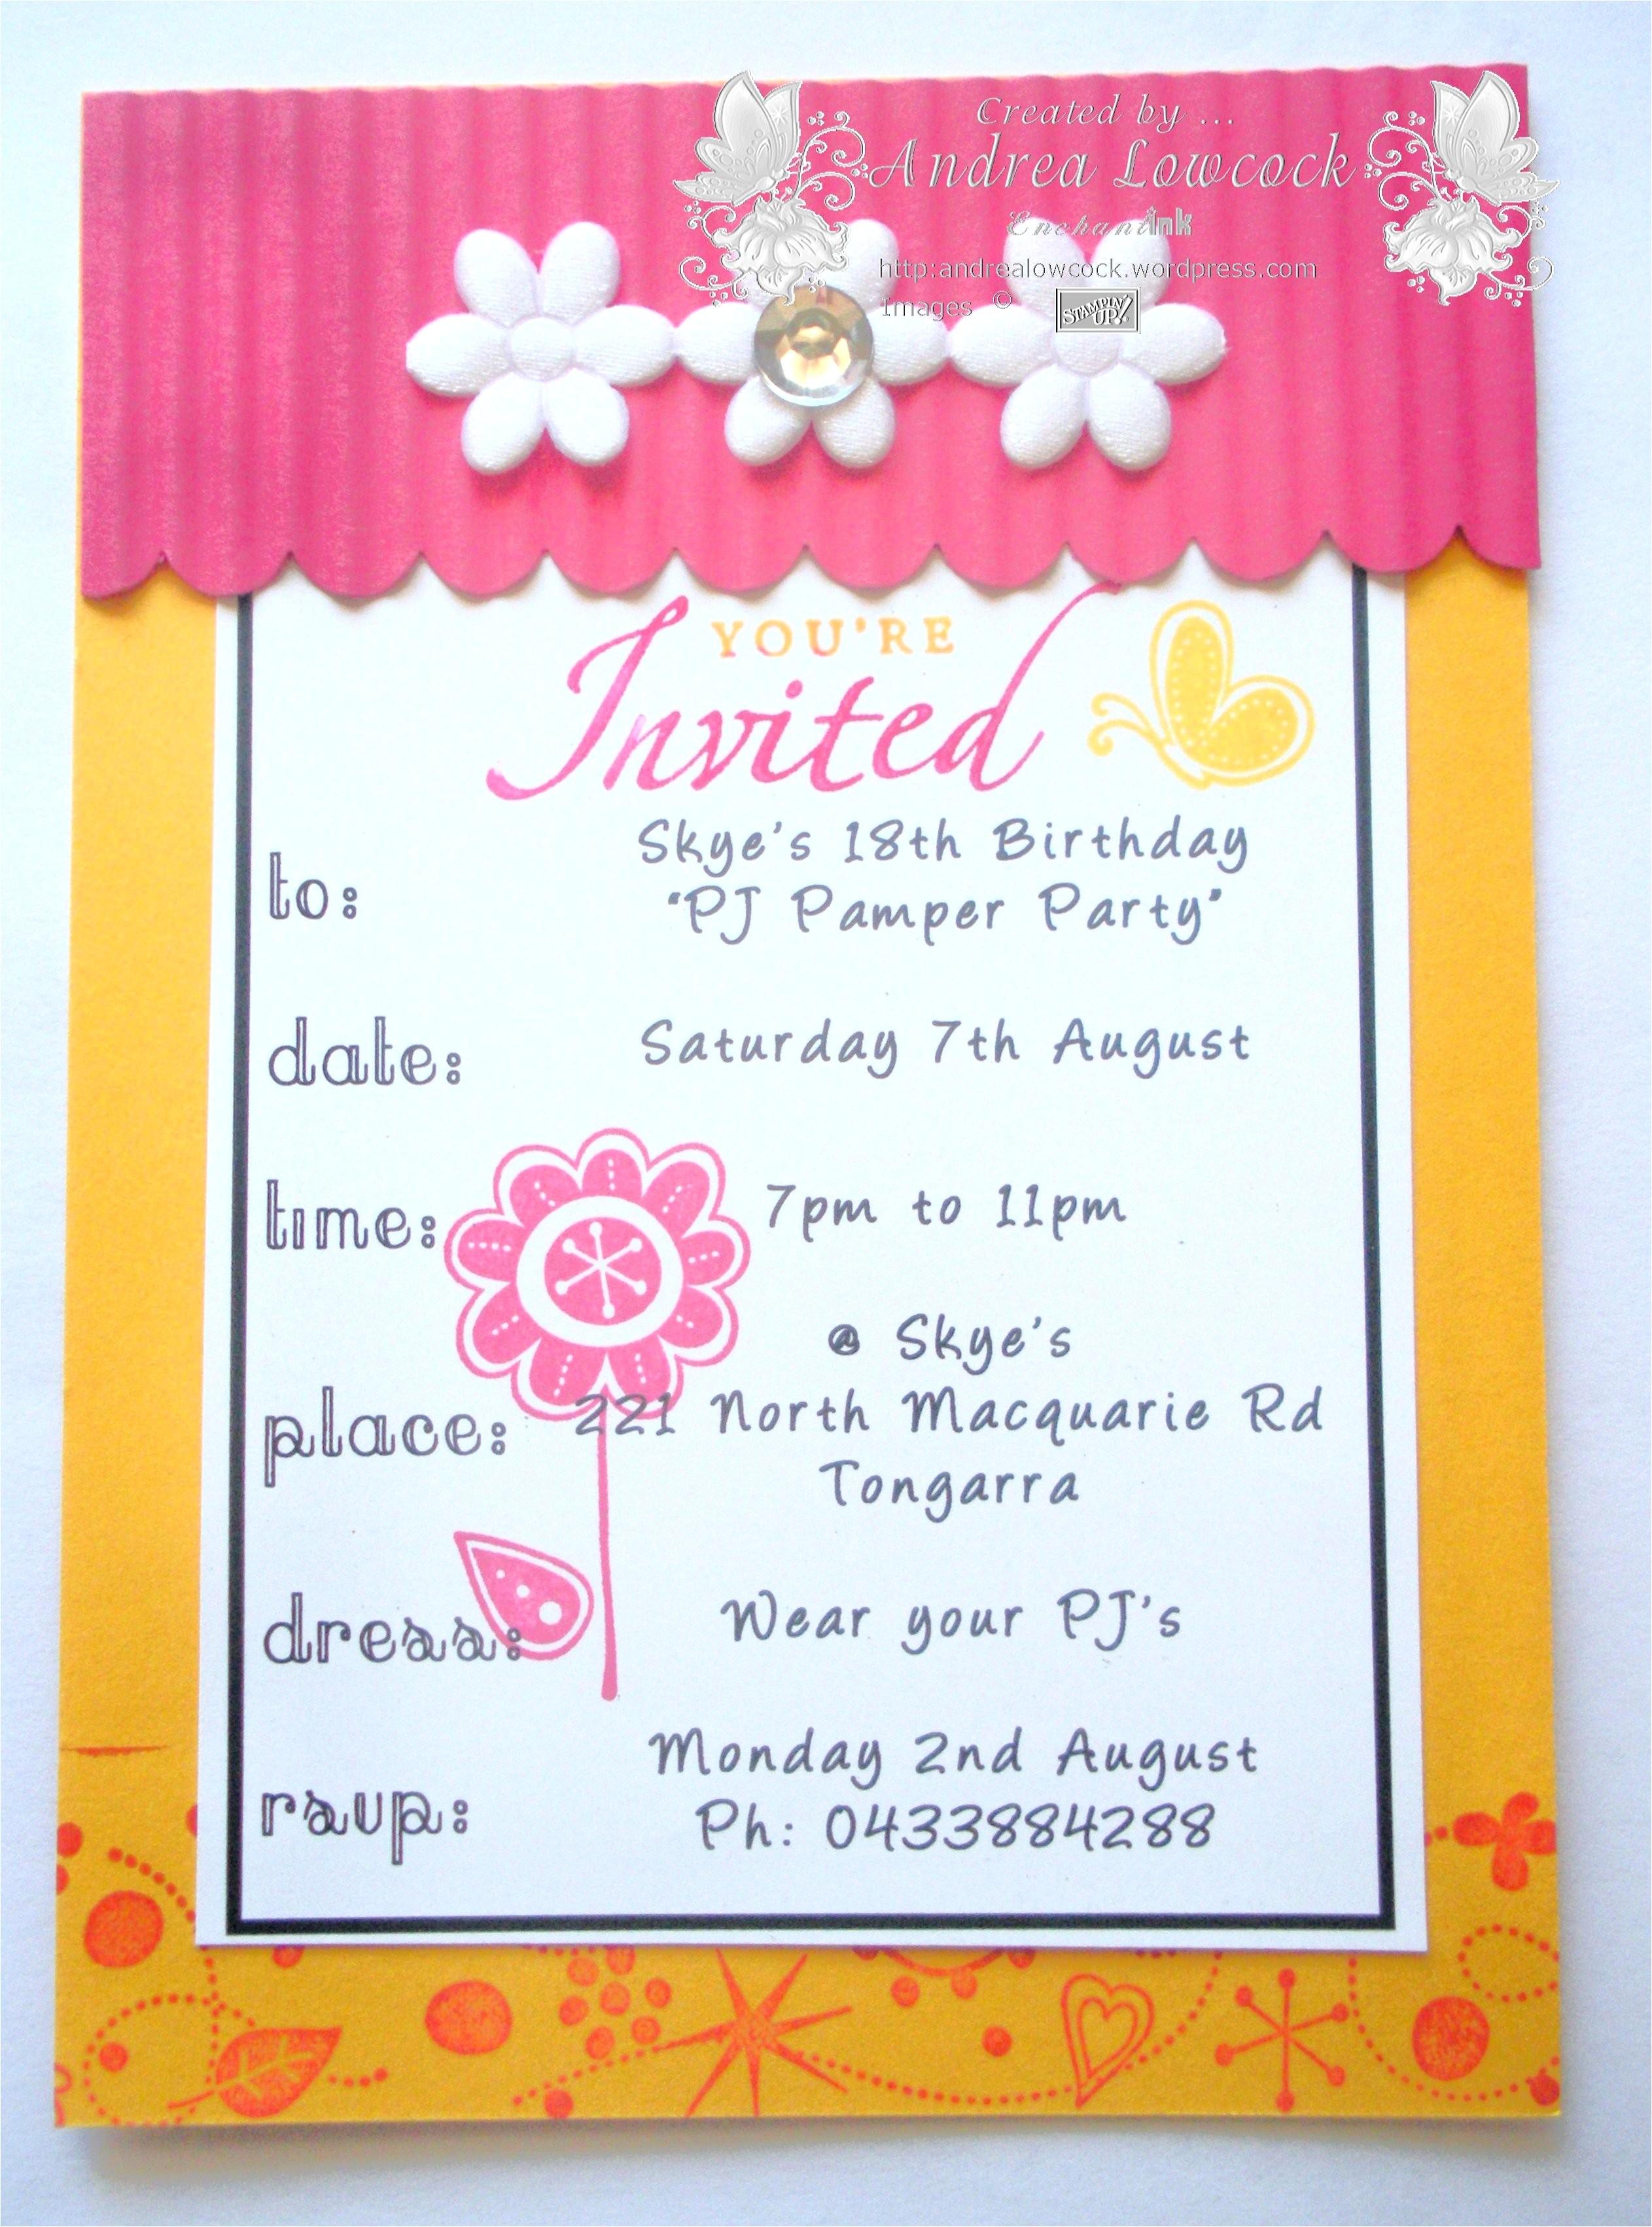 editable 1st birthday invitation card free download luxury happy birthday invitation card in marathi